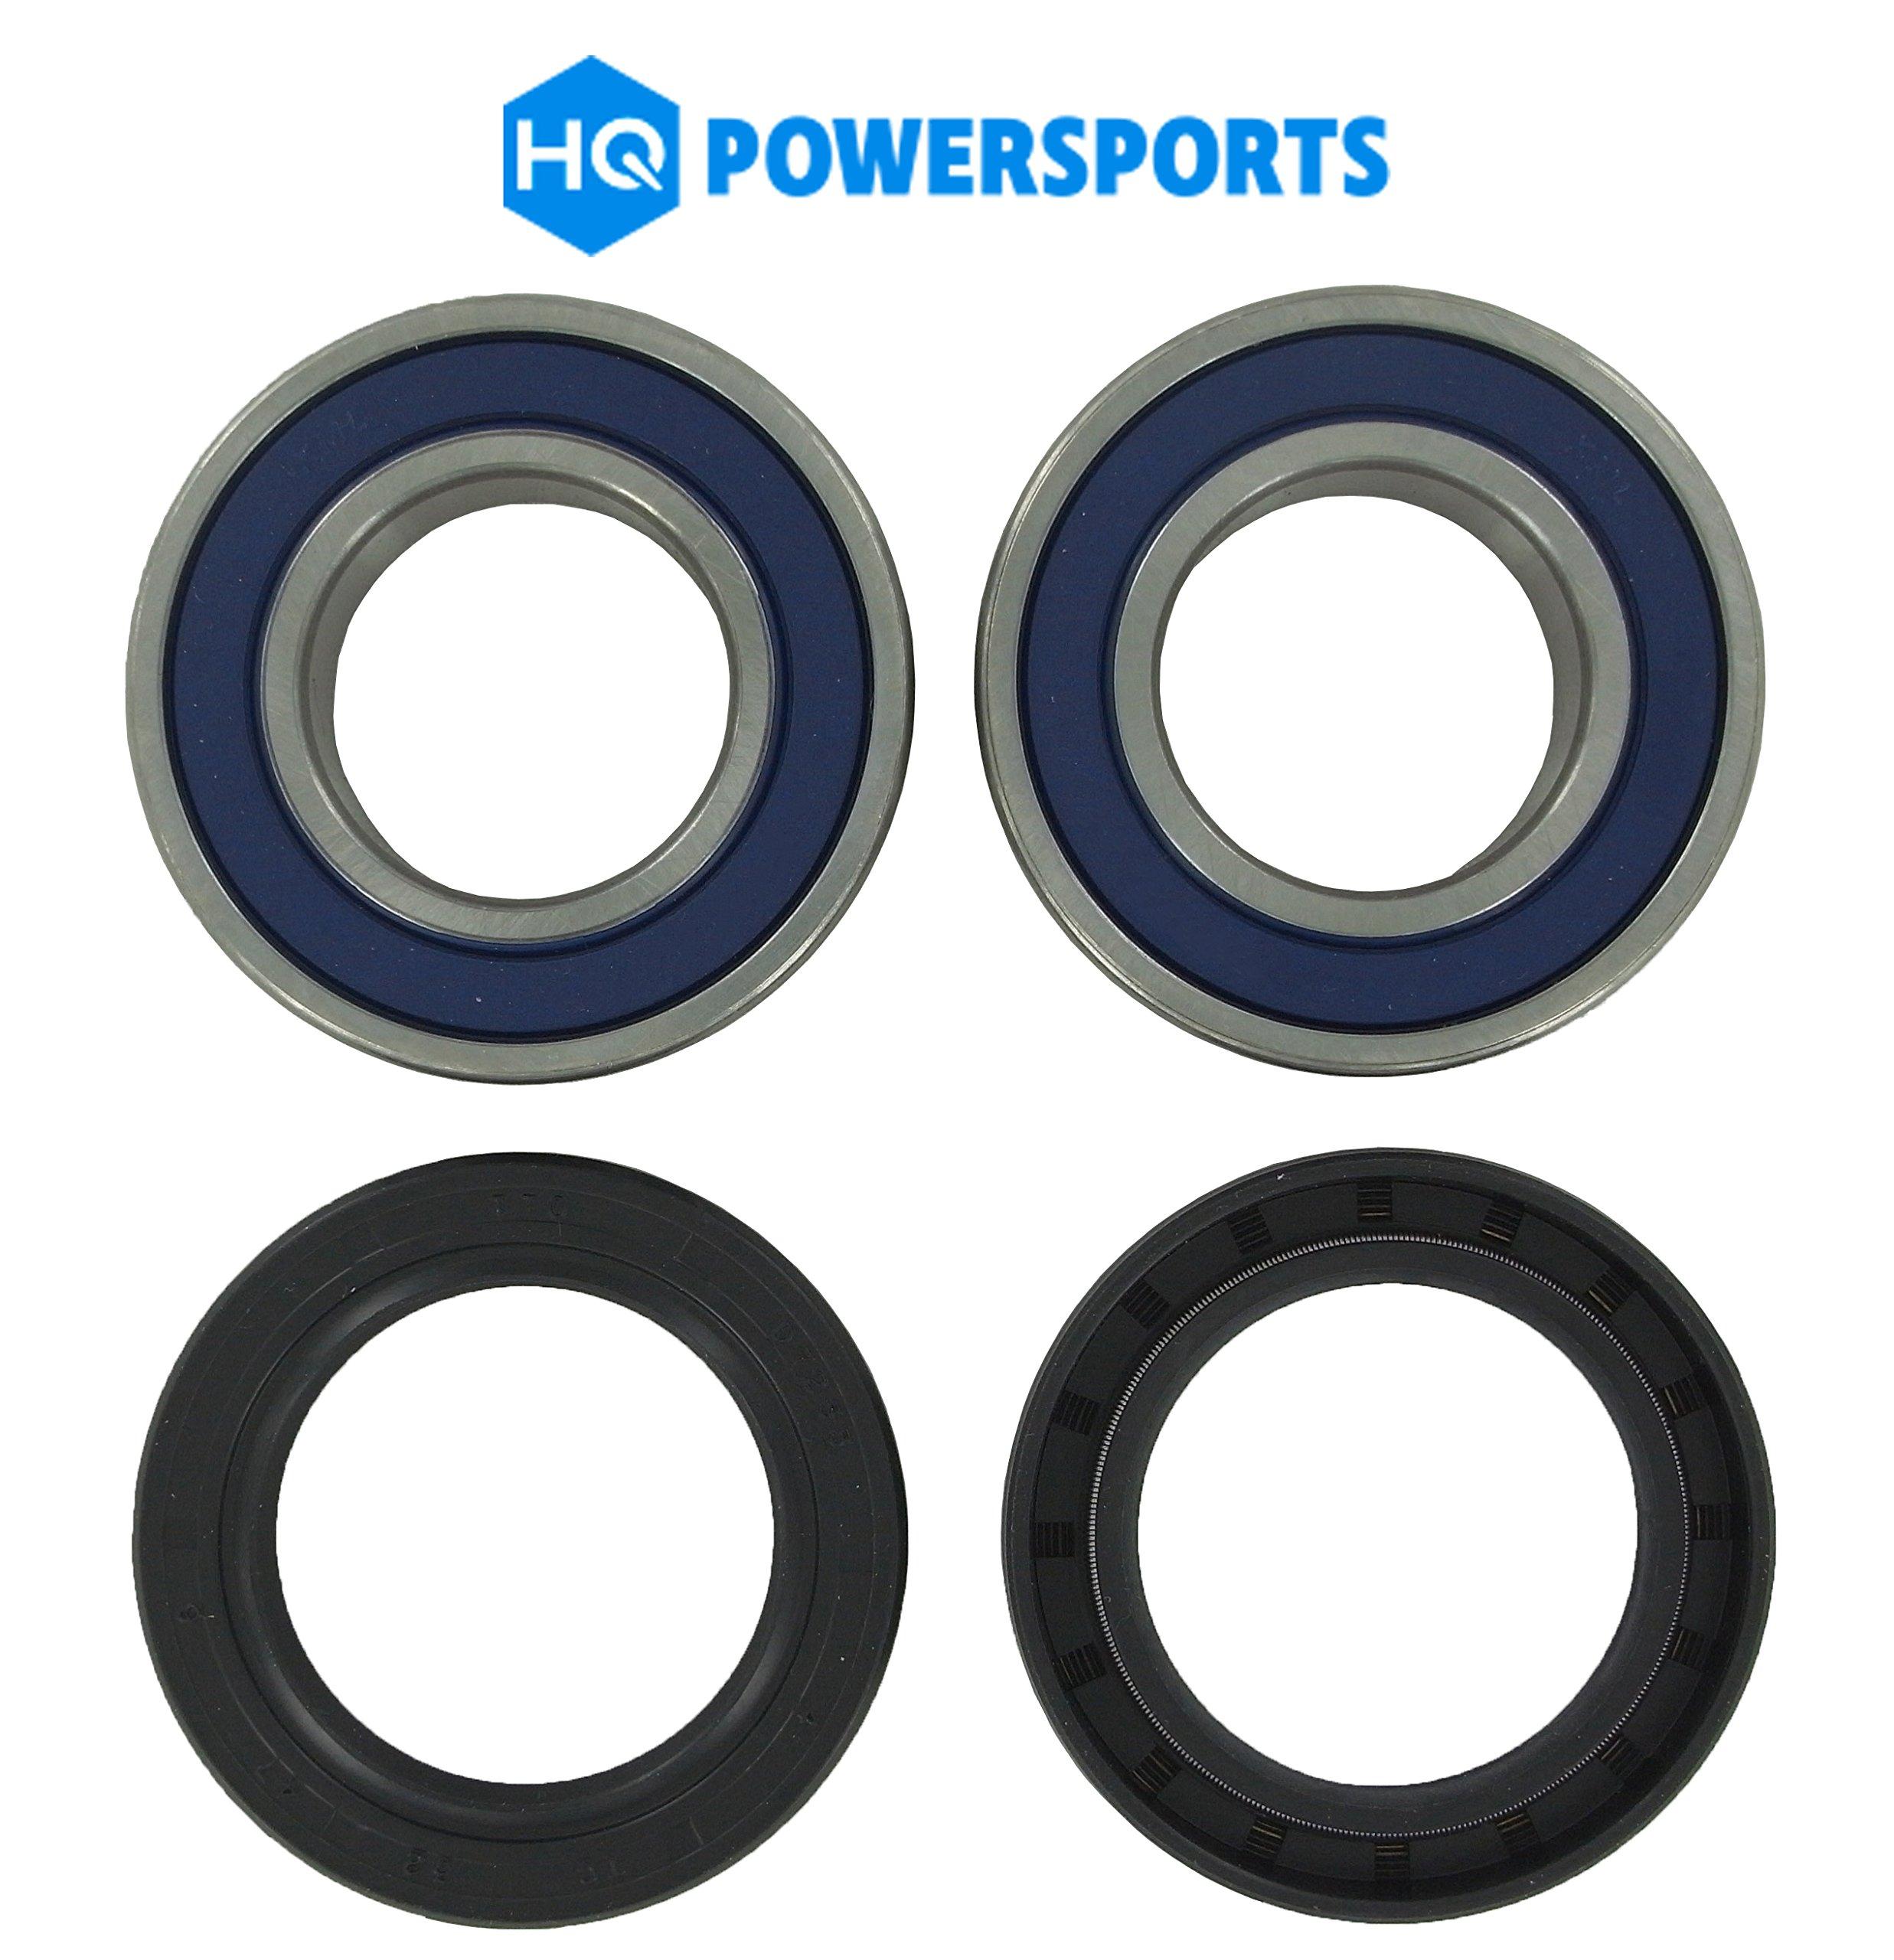 New HQ Powersports Rear Wheel Bearing KTM EXC 200 1998 1999 2000 01 02 03 04 05